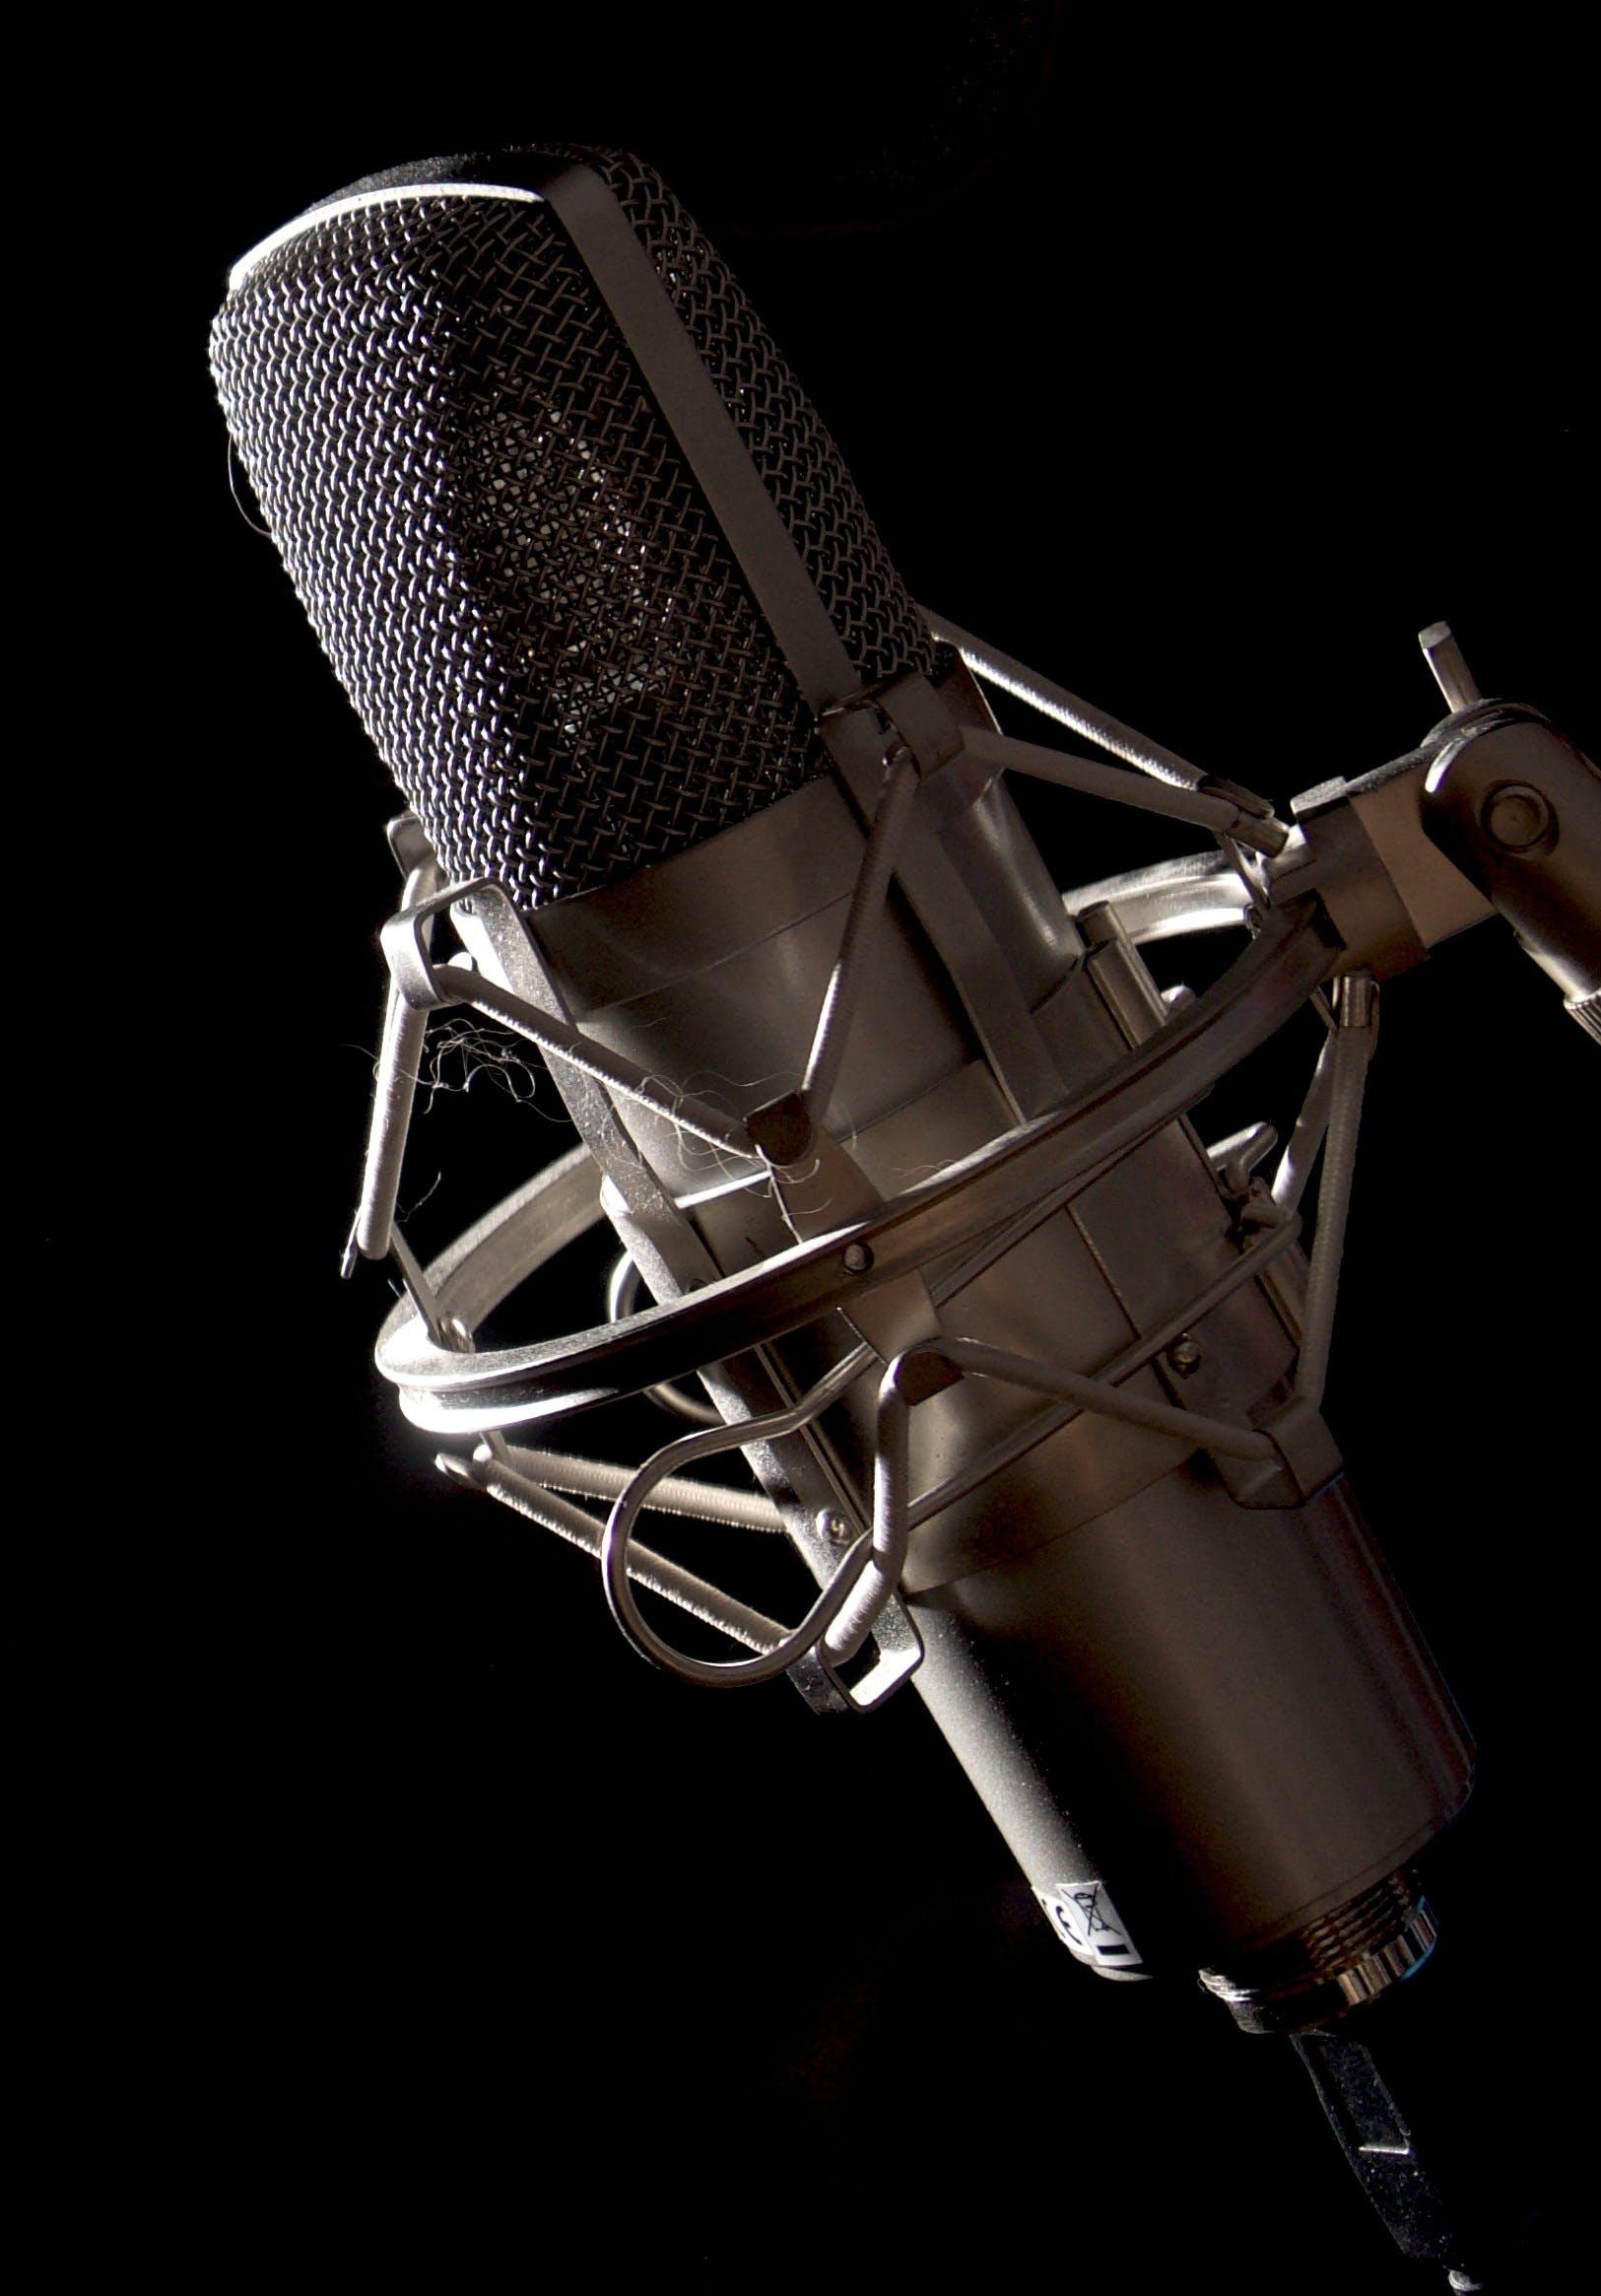 Free stock photo of audio, device, electronics, microphone